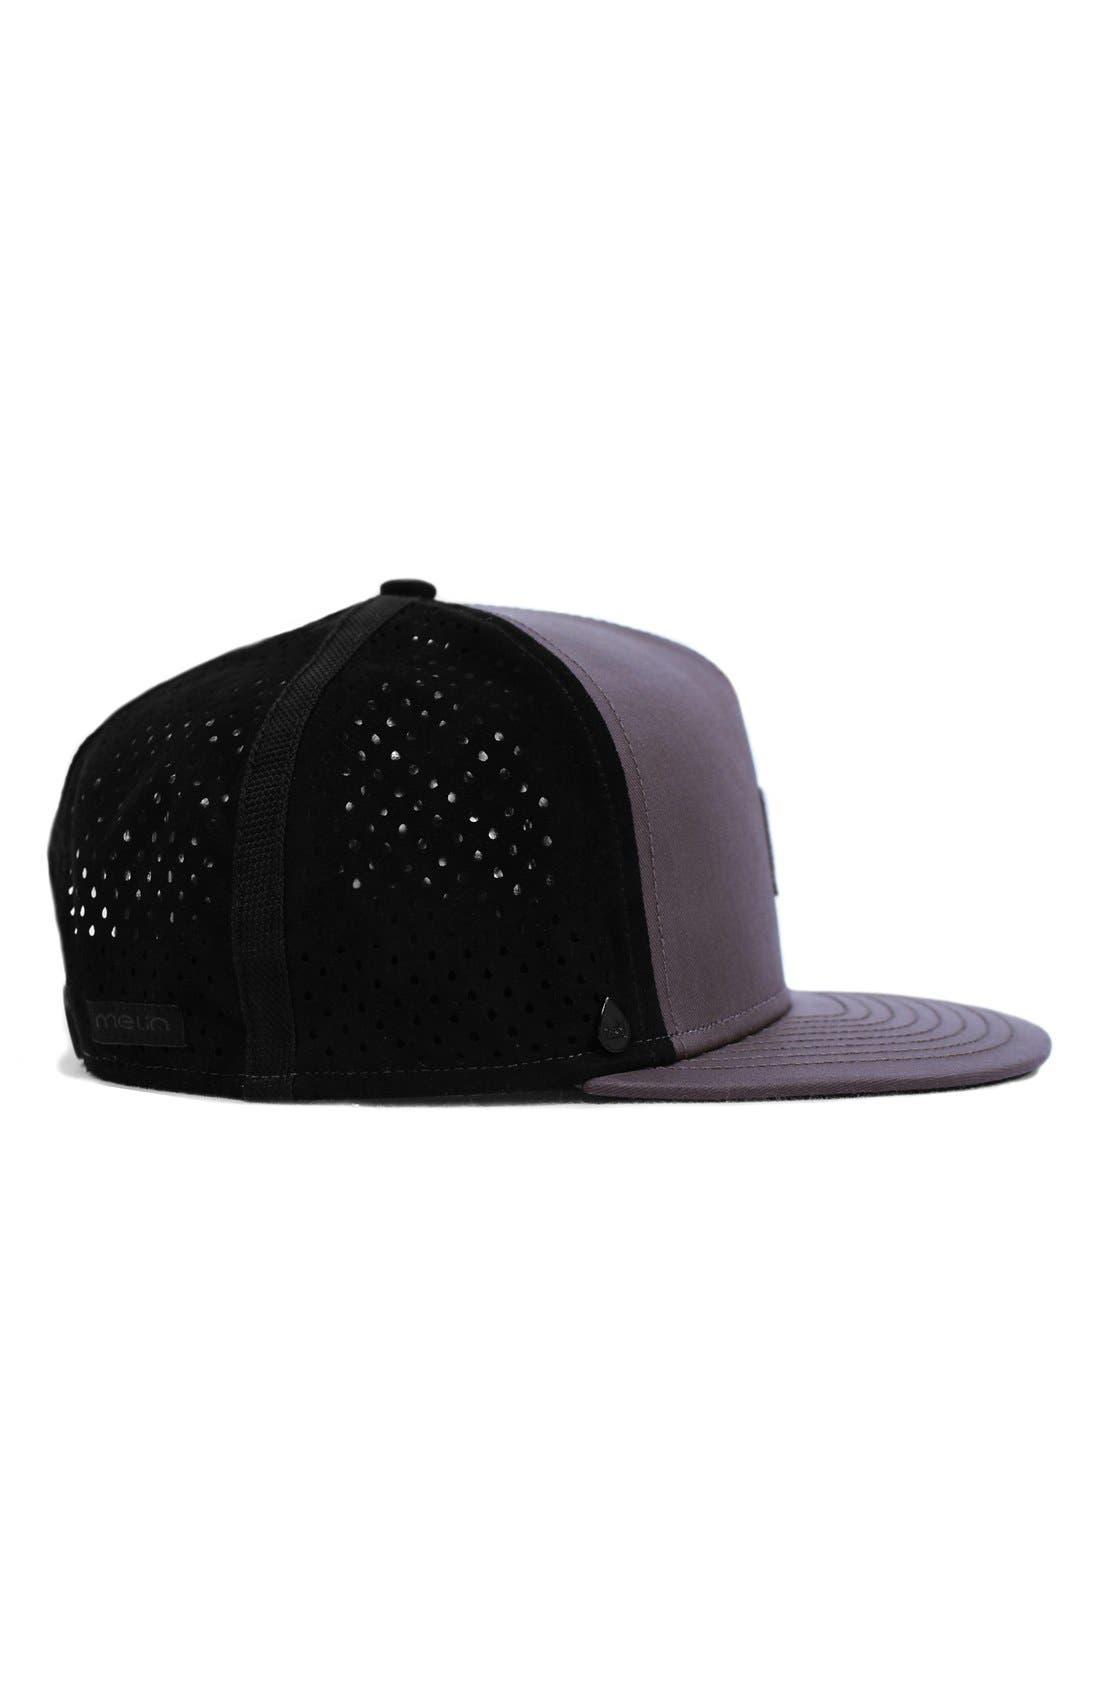 'The Nomad' Split Fit Snapback Baseball Cap,                             Alternate thumbnail 4, color,                             Taupe